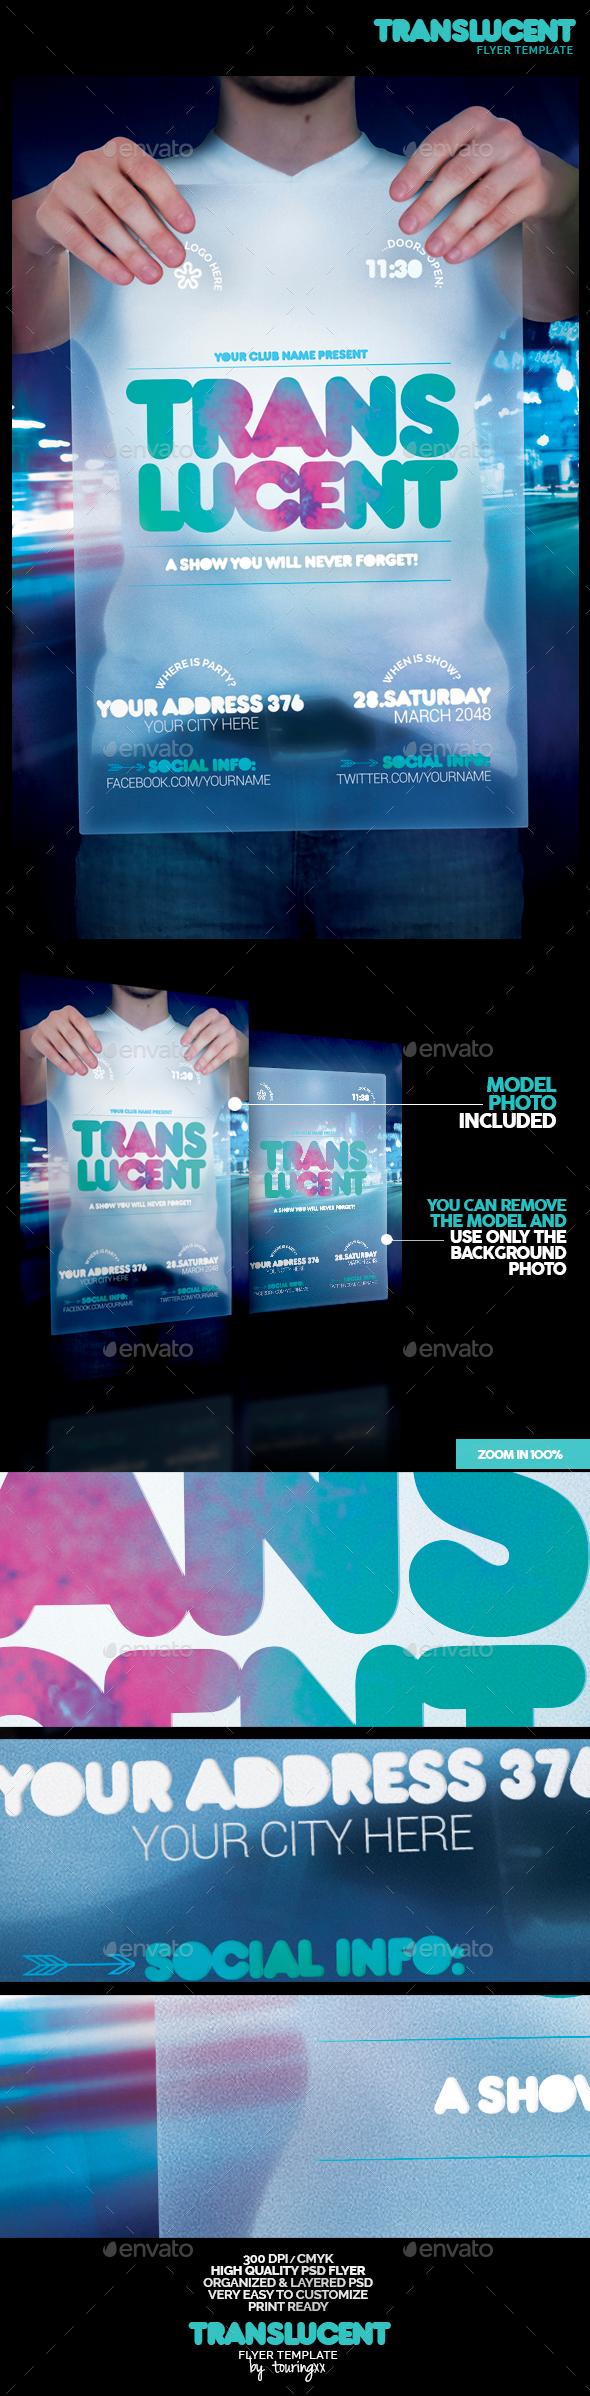 Translucent Flyer Template - Flyers Print Templates